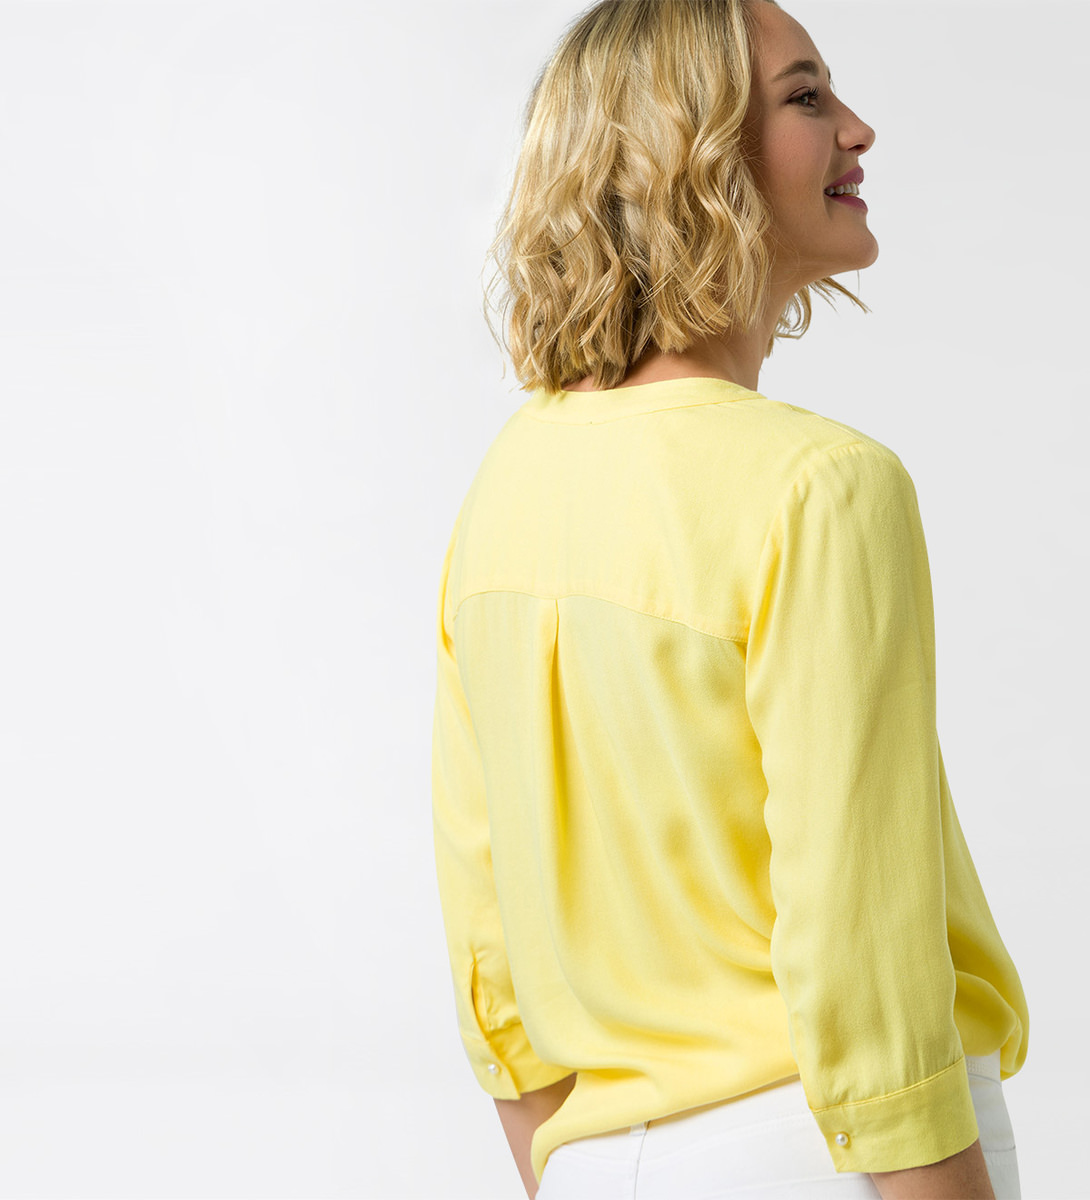 Bluse mit Serafino-Ausschnitt in lemon